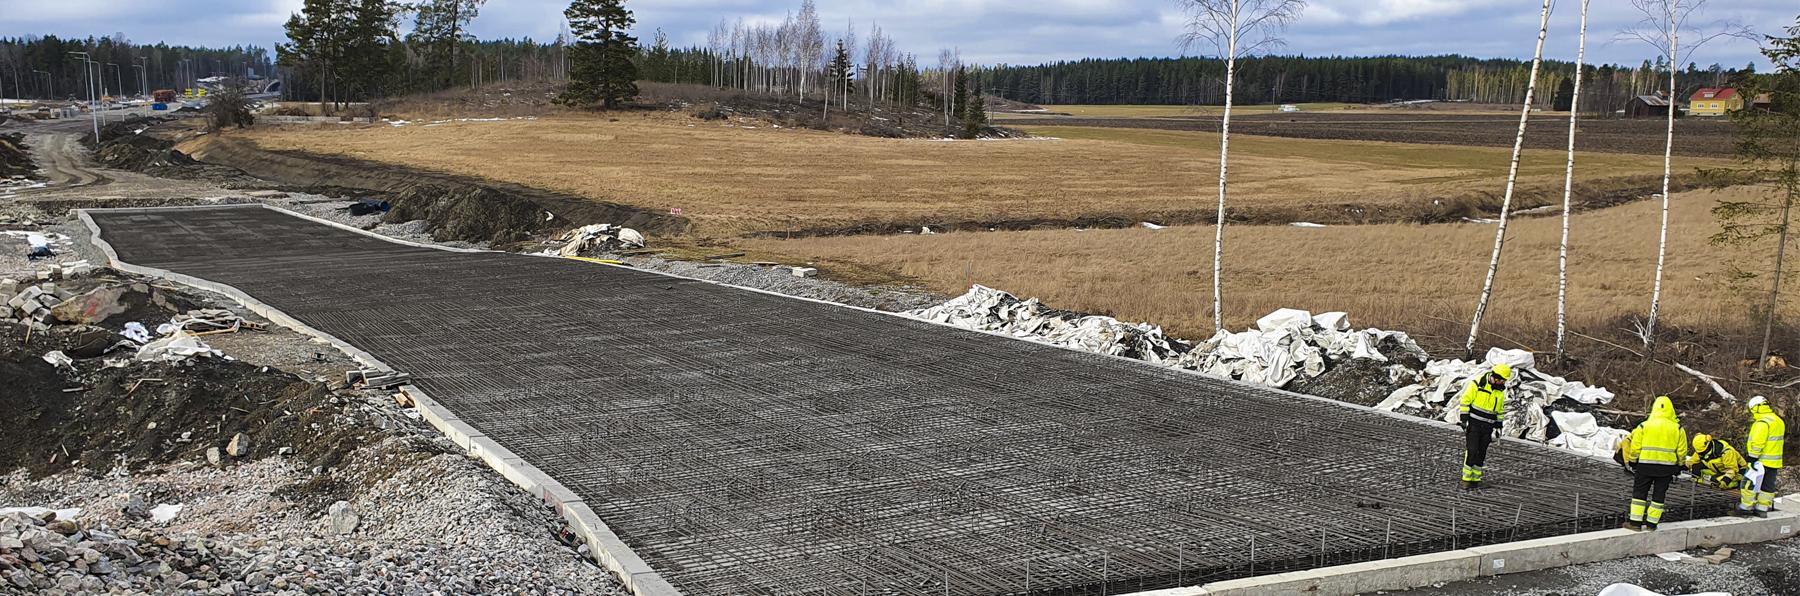 Kirismäki interchange with a pile-supported slab structure